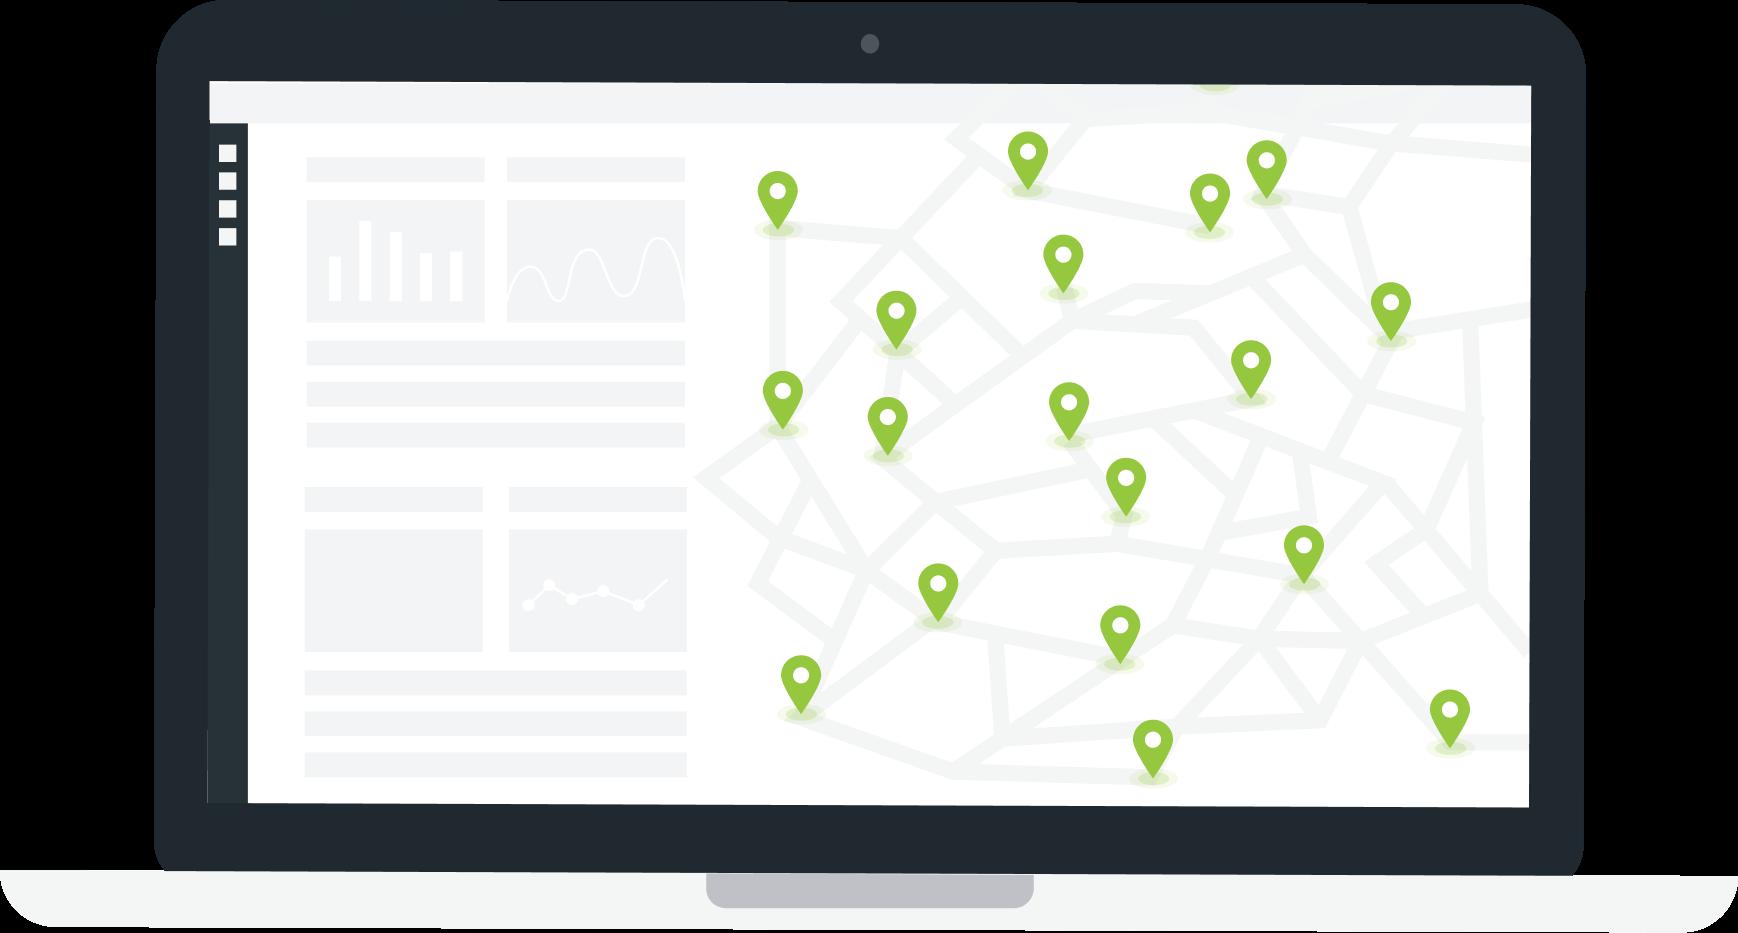 Online kart som viser alt